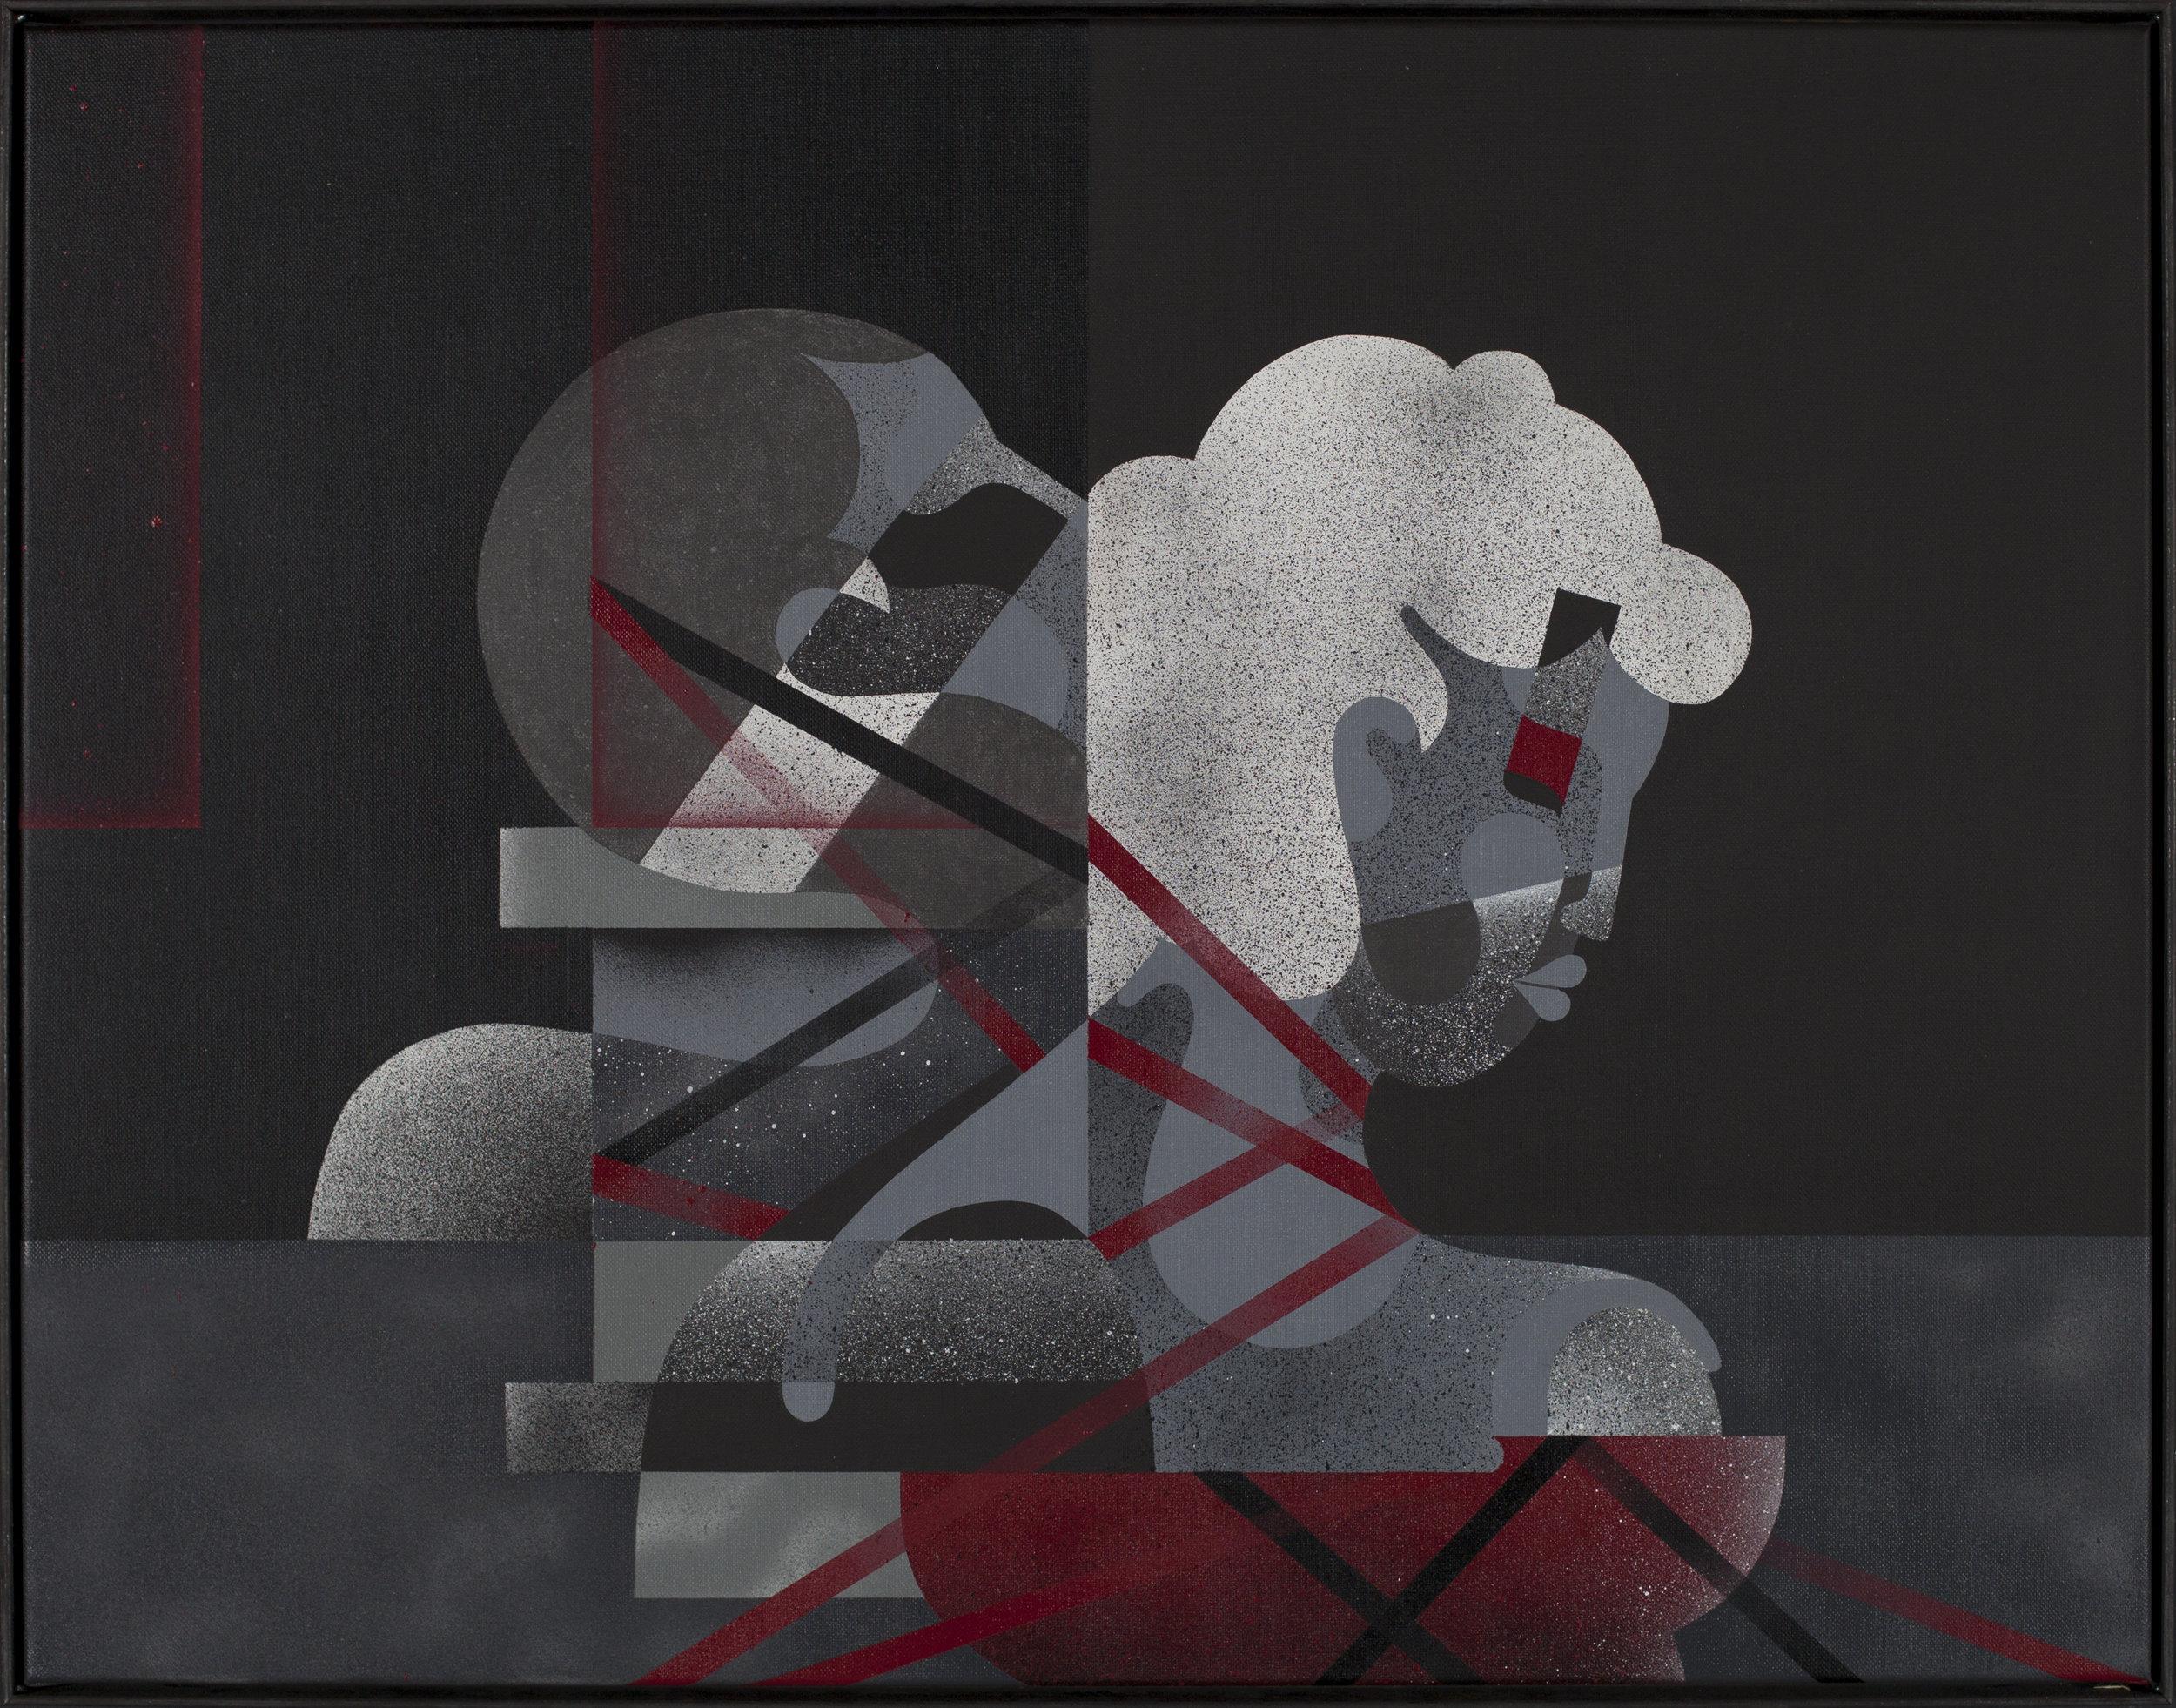 Leidenschaft, Scarlet by James Reka